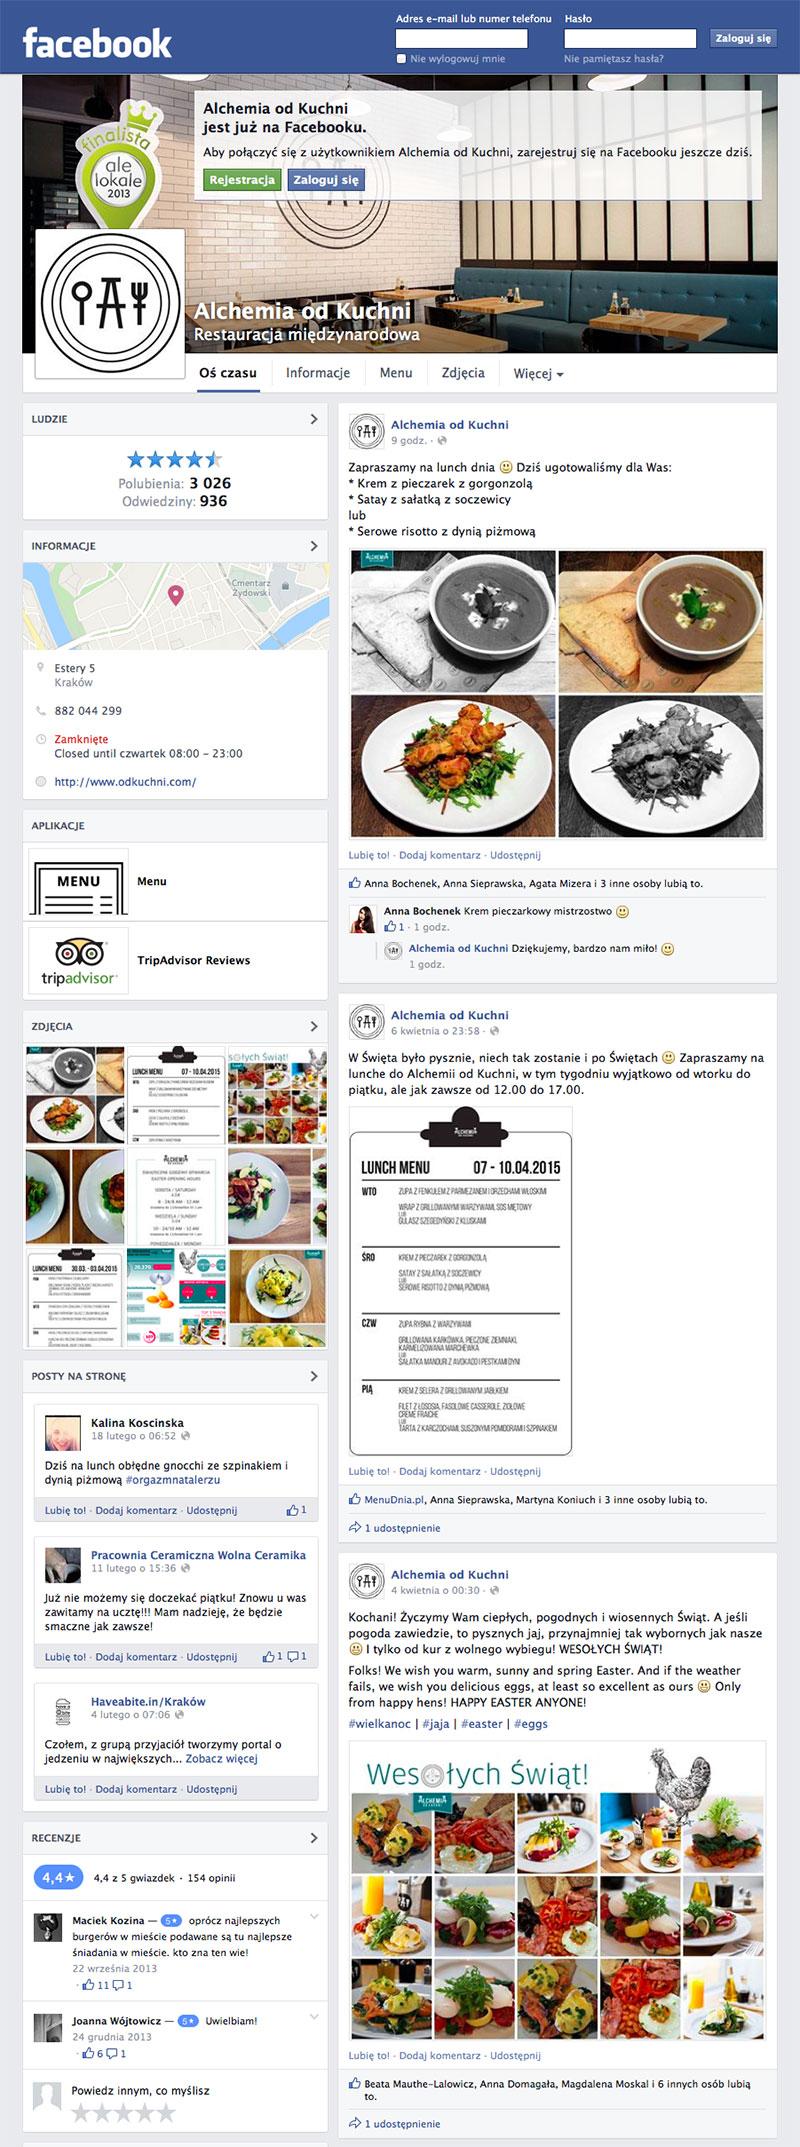 Dorota Gostylla - Alchemia Od Kuchni Facebook fanpage